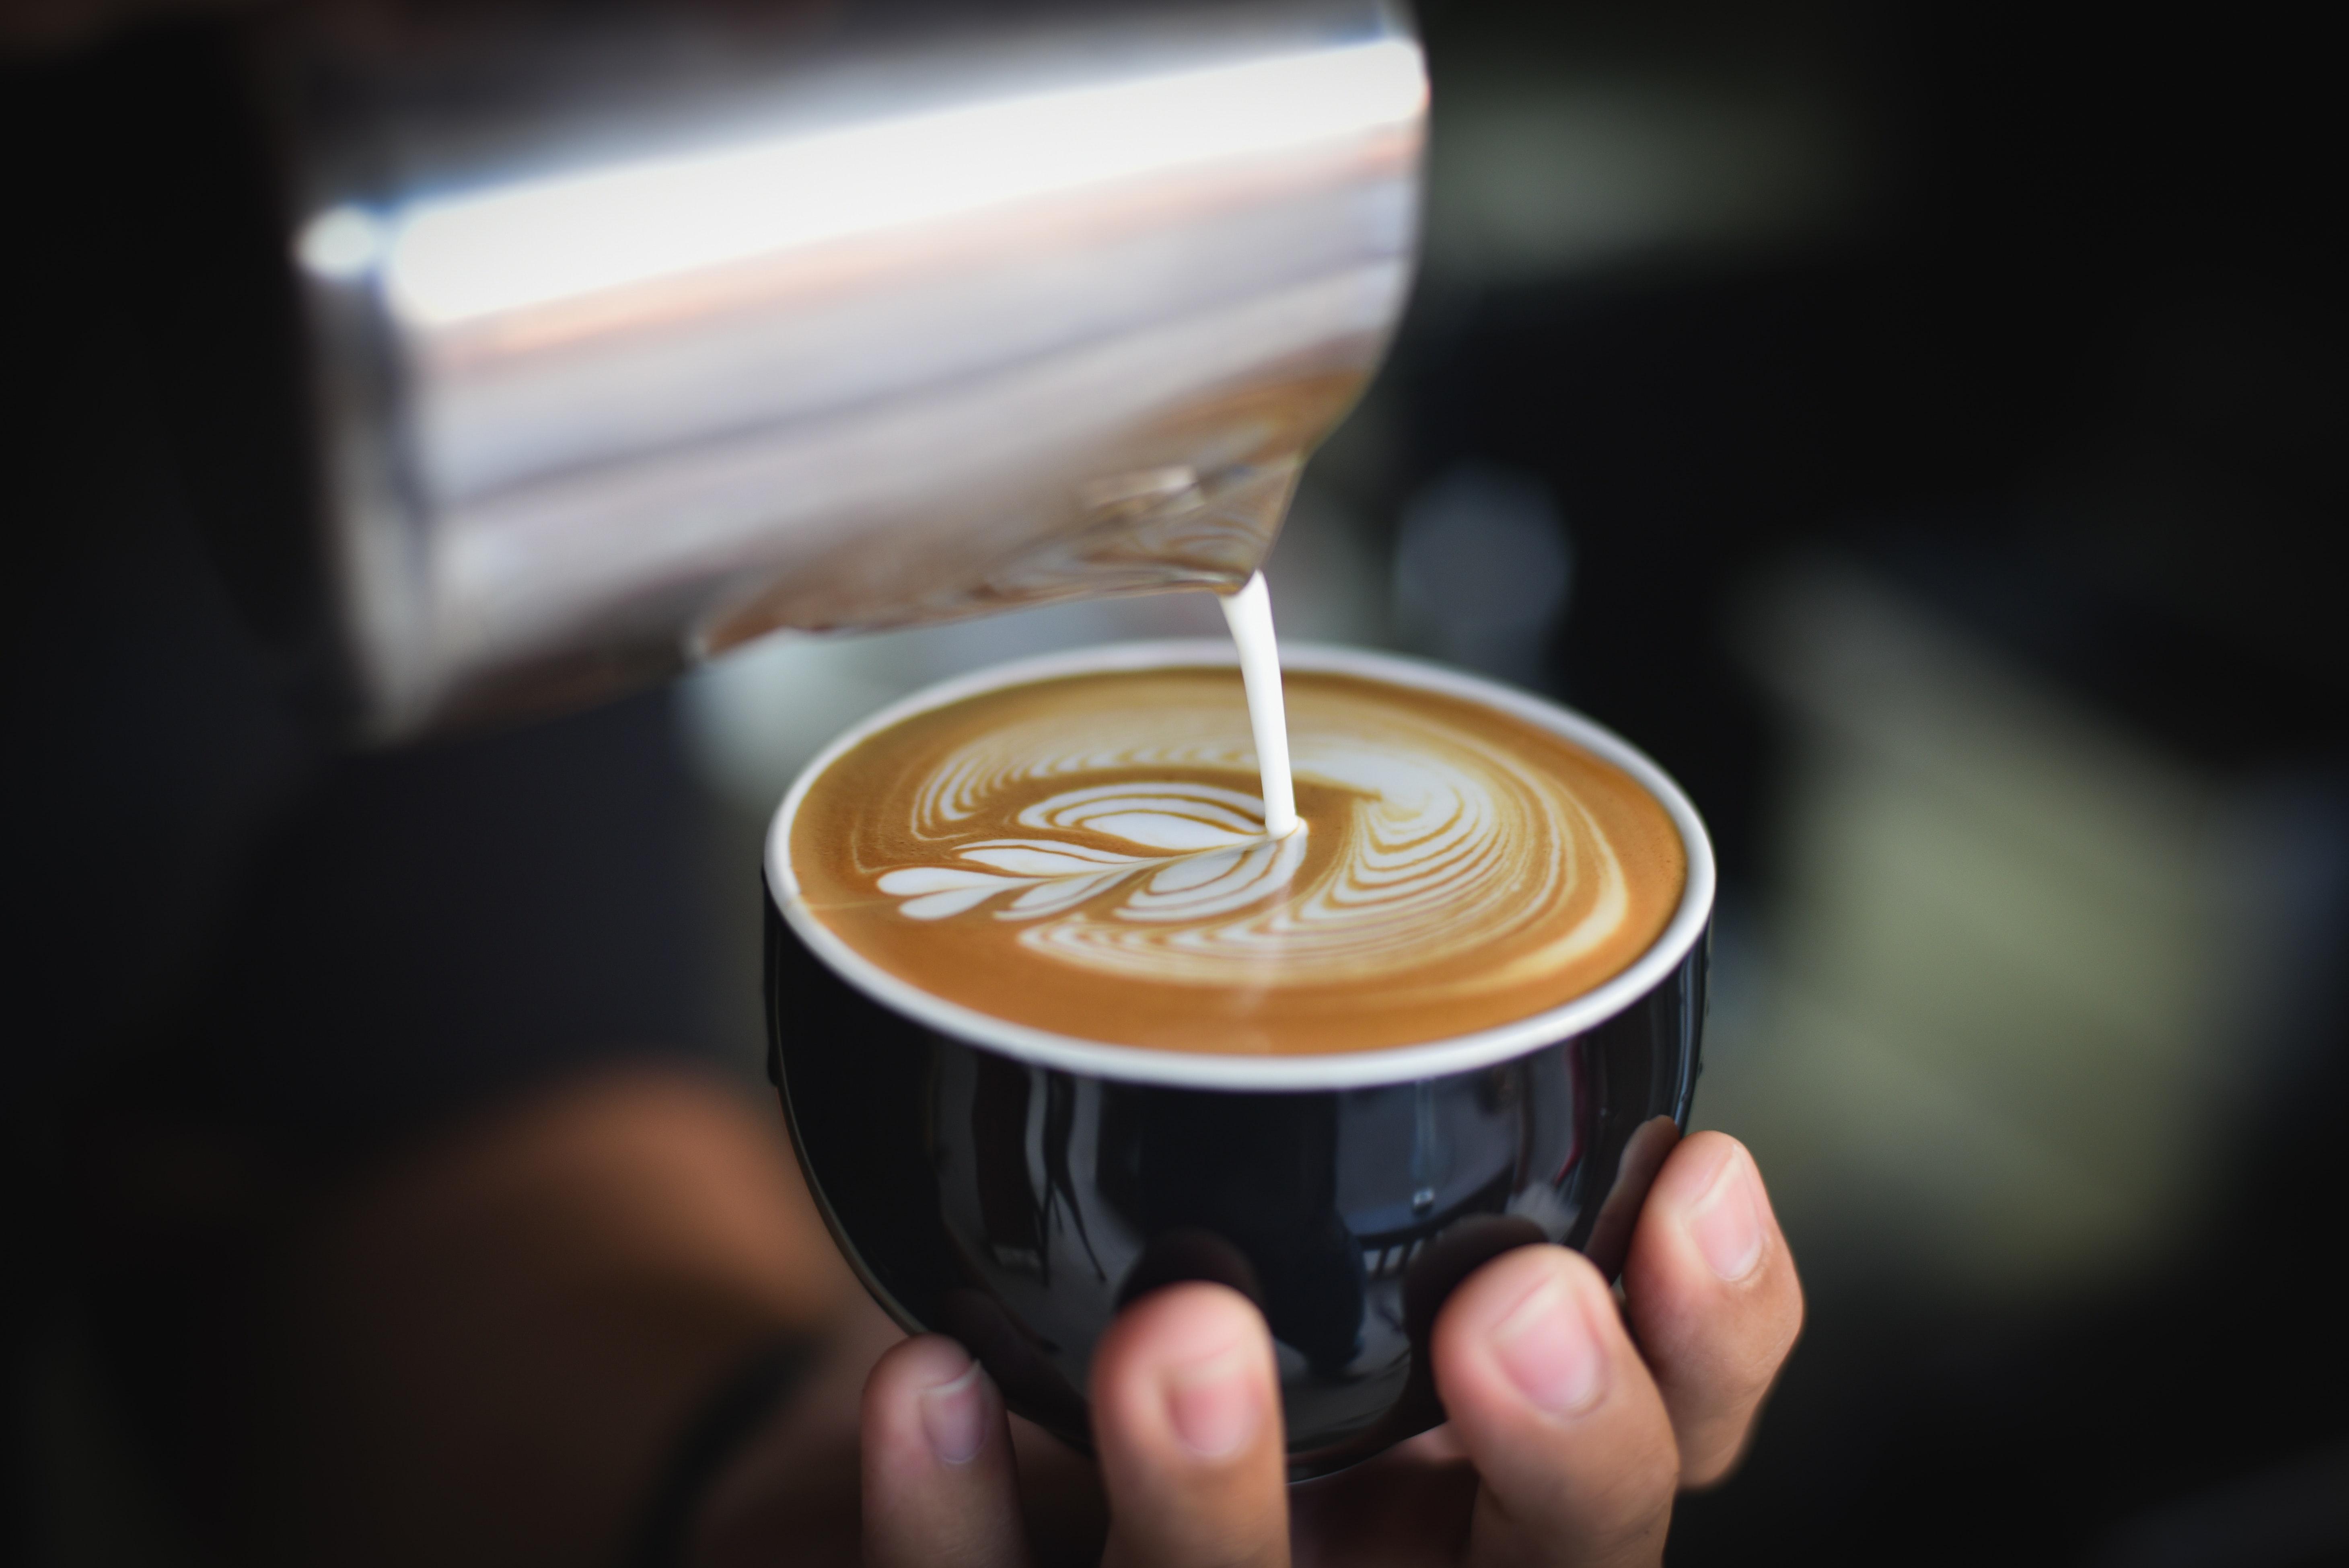 premium-cafe-franchise-existing-opportunity-sydneys-west-3